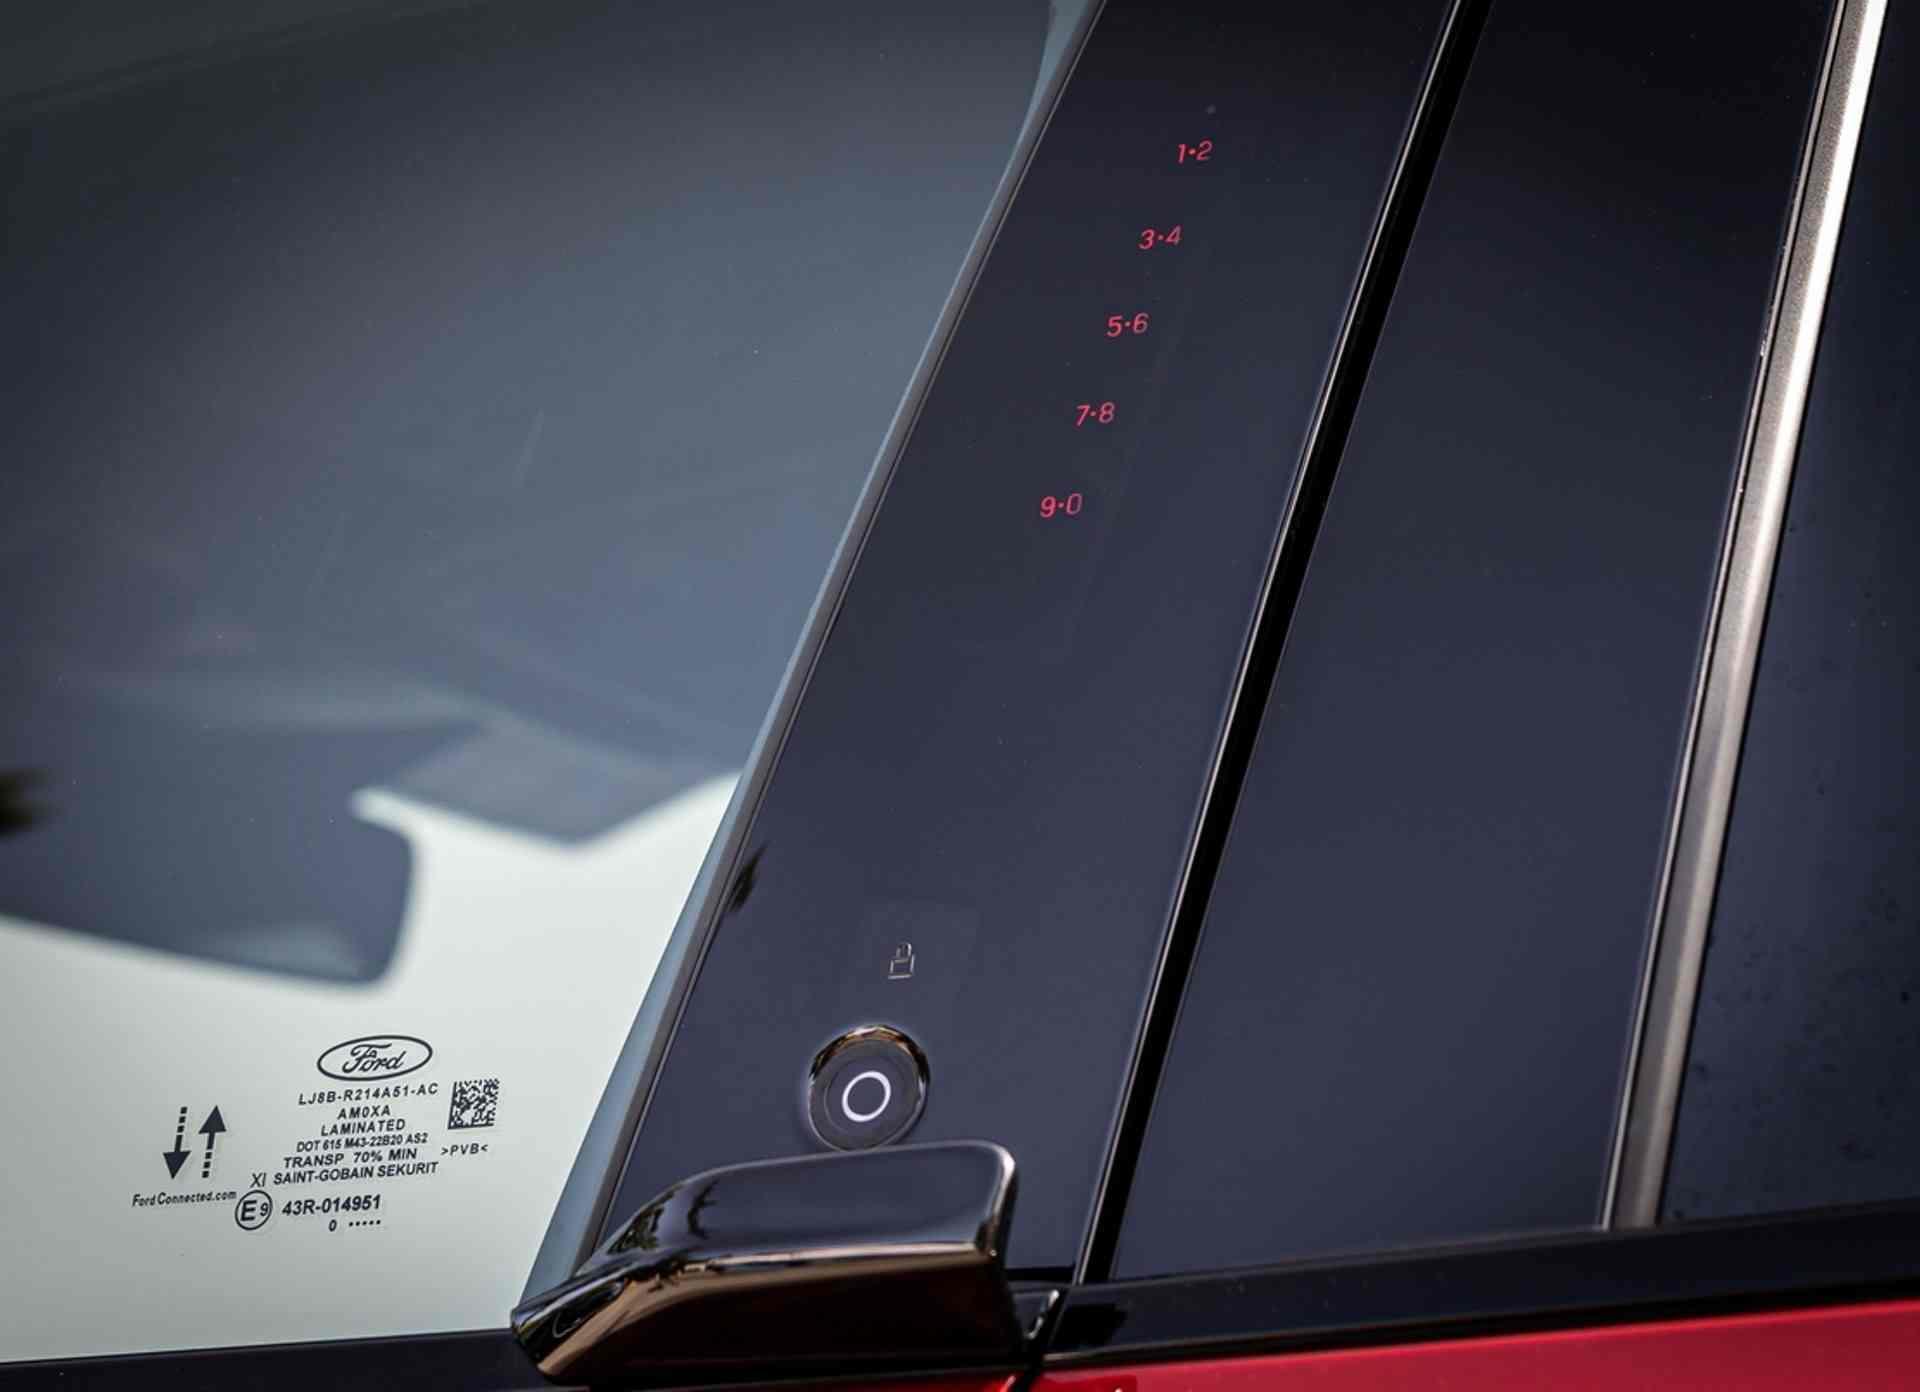 Ford_Mustang_Mach-E_greek_presskit-0176